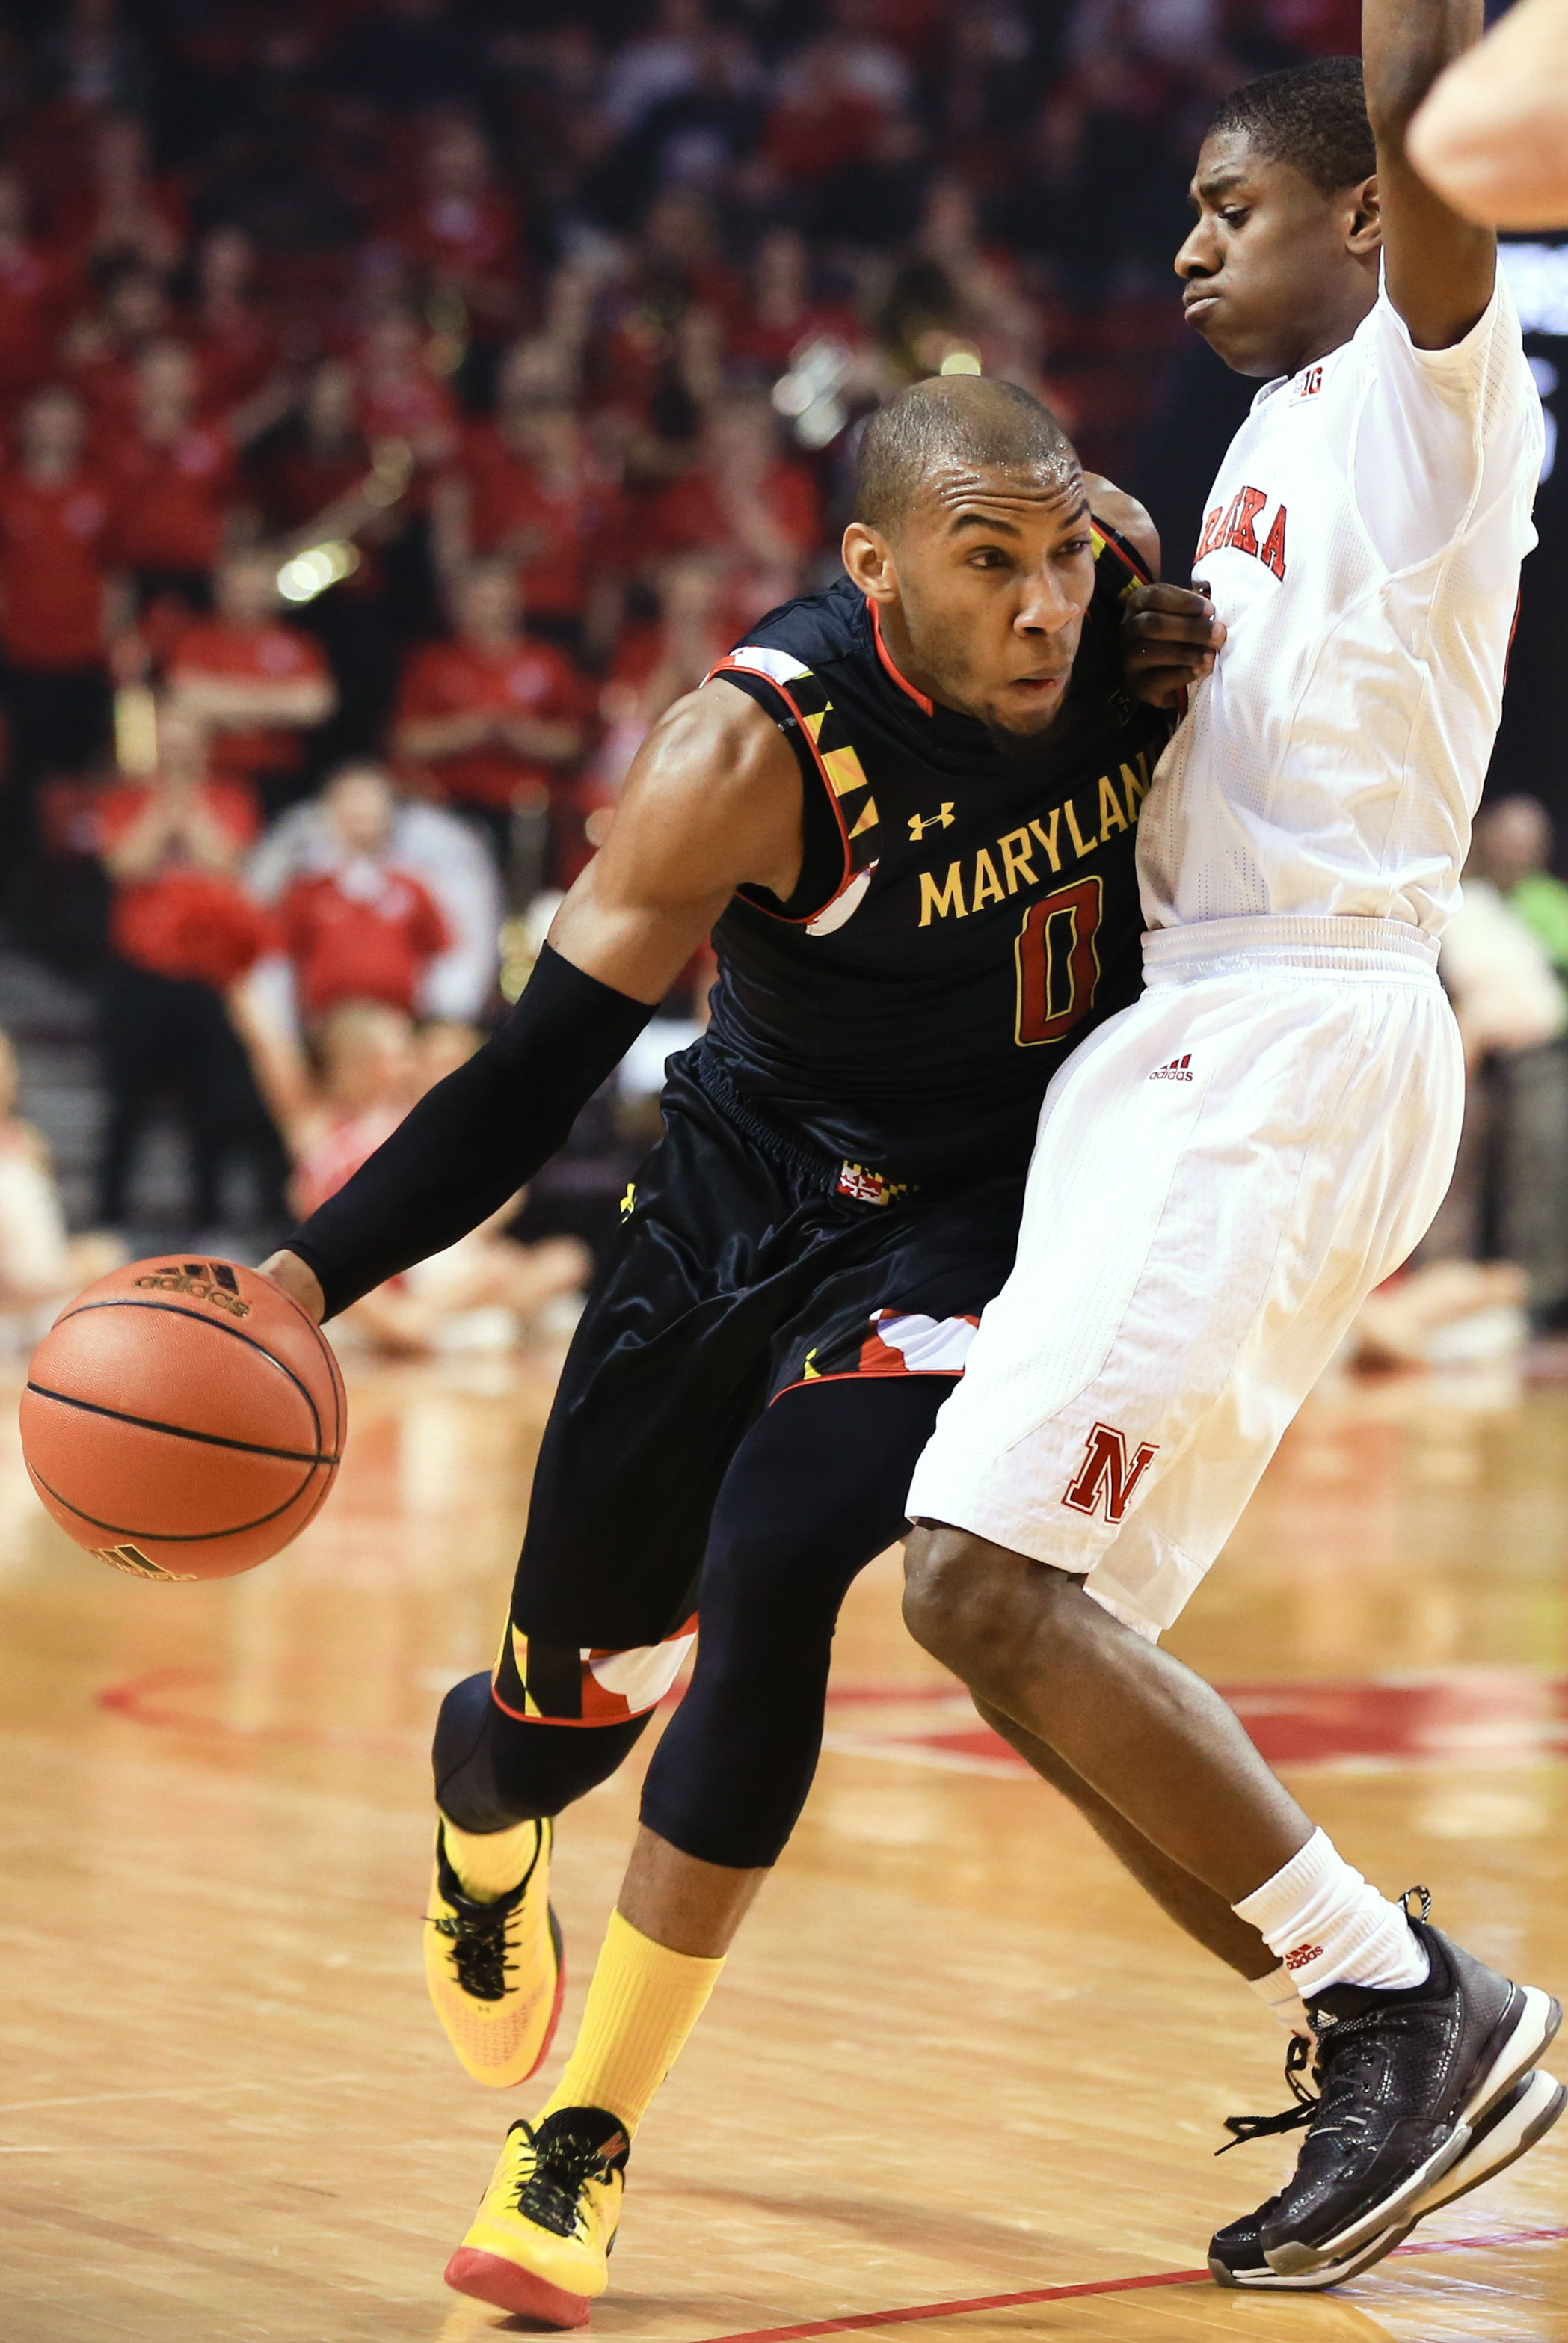 Maryland's Rasheed Sulaimon (0) drives around Nebraska's Glynn Watson Jr. (5) during the first half of an NCAA college basketball game in Lincoln, Neb., Wednesday, Feb. 3, 2016. (AP Photo/Nati Harnik)